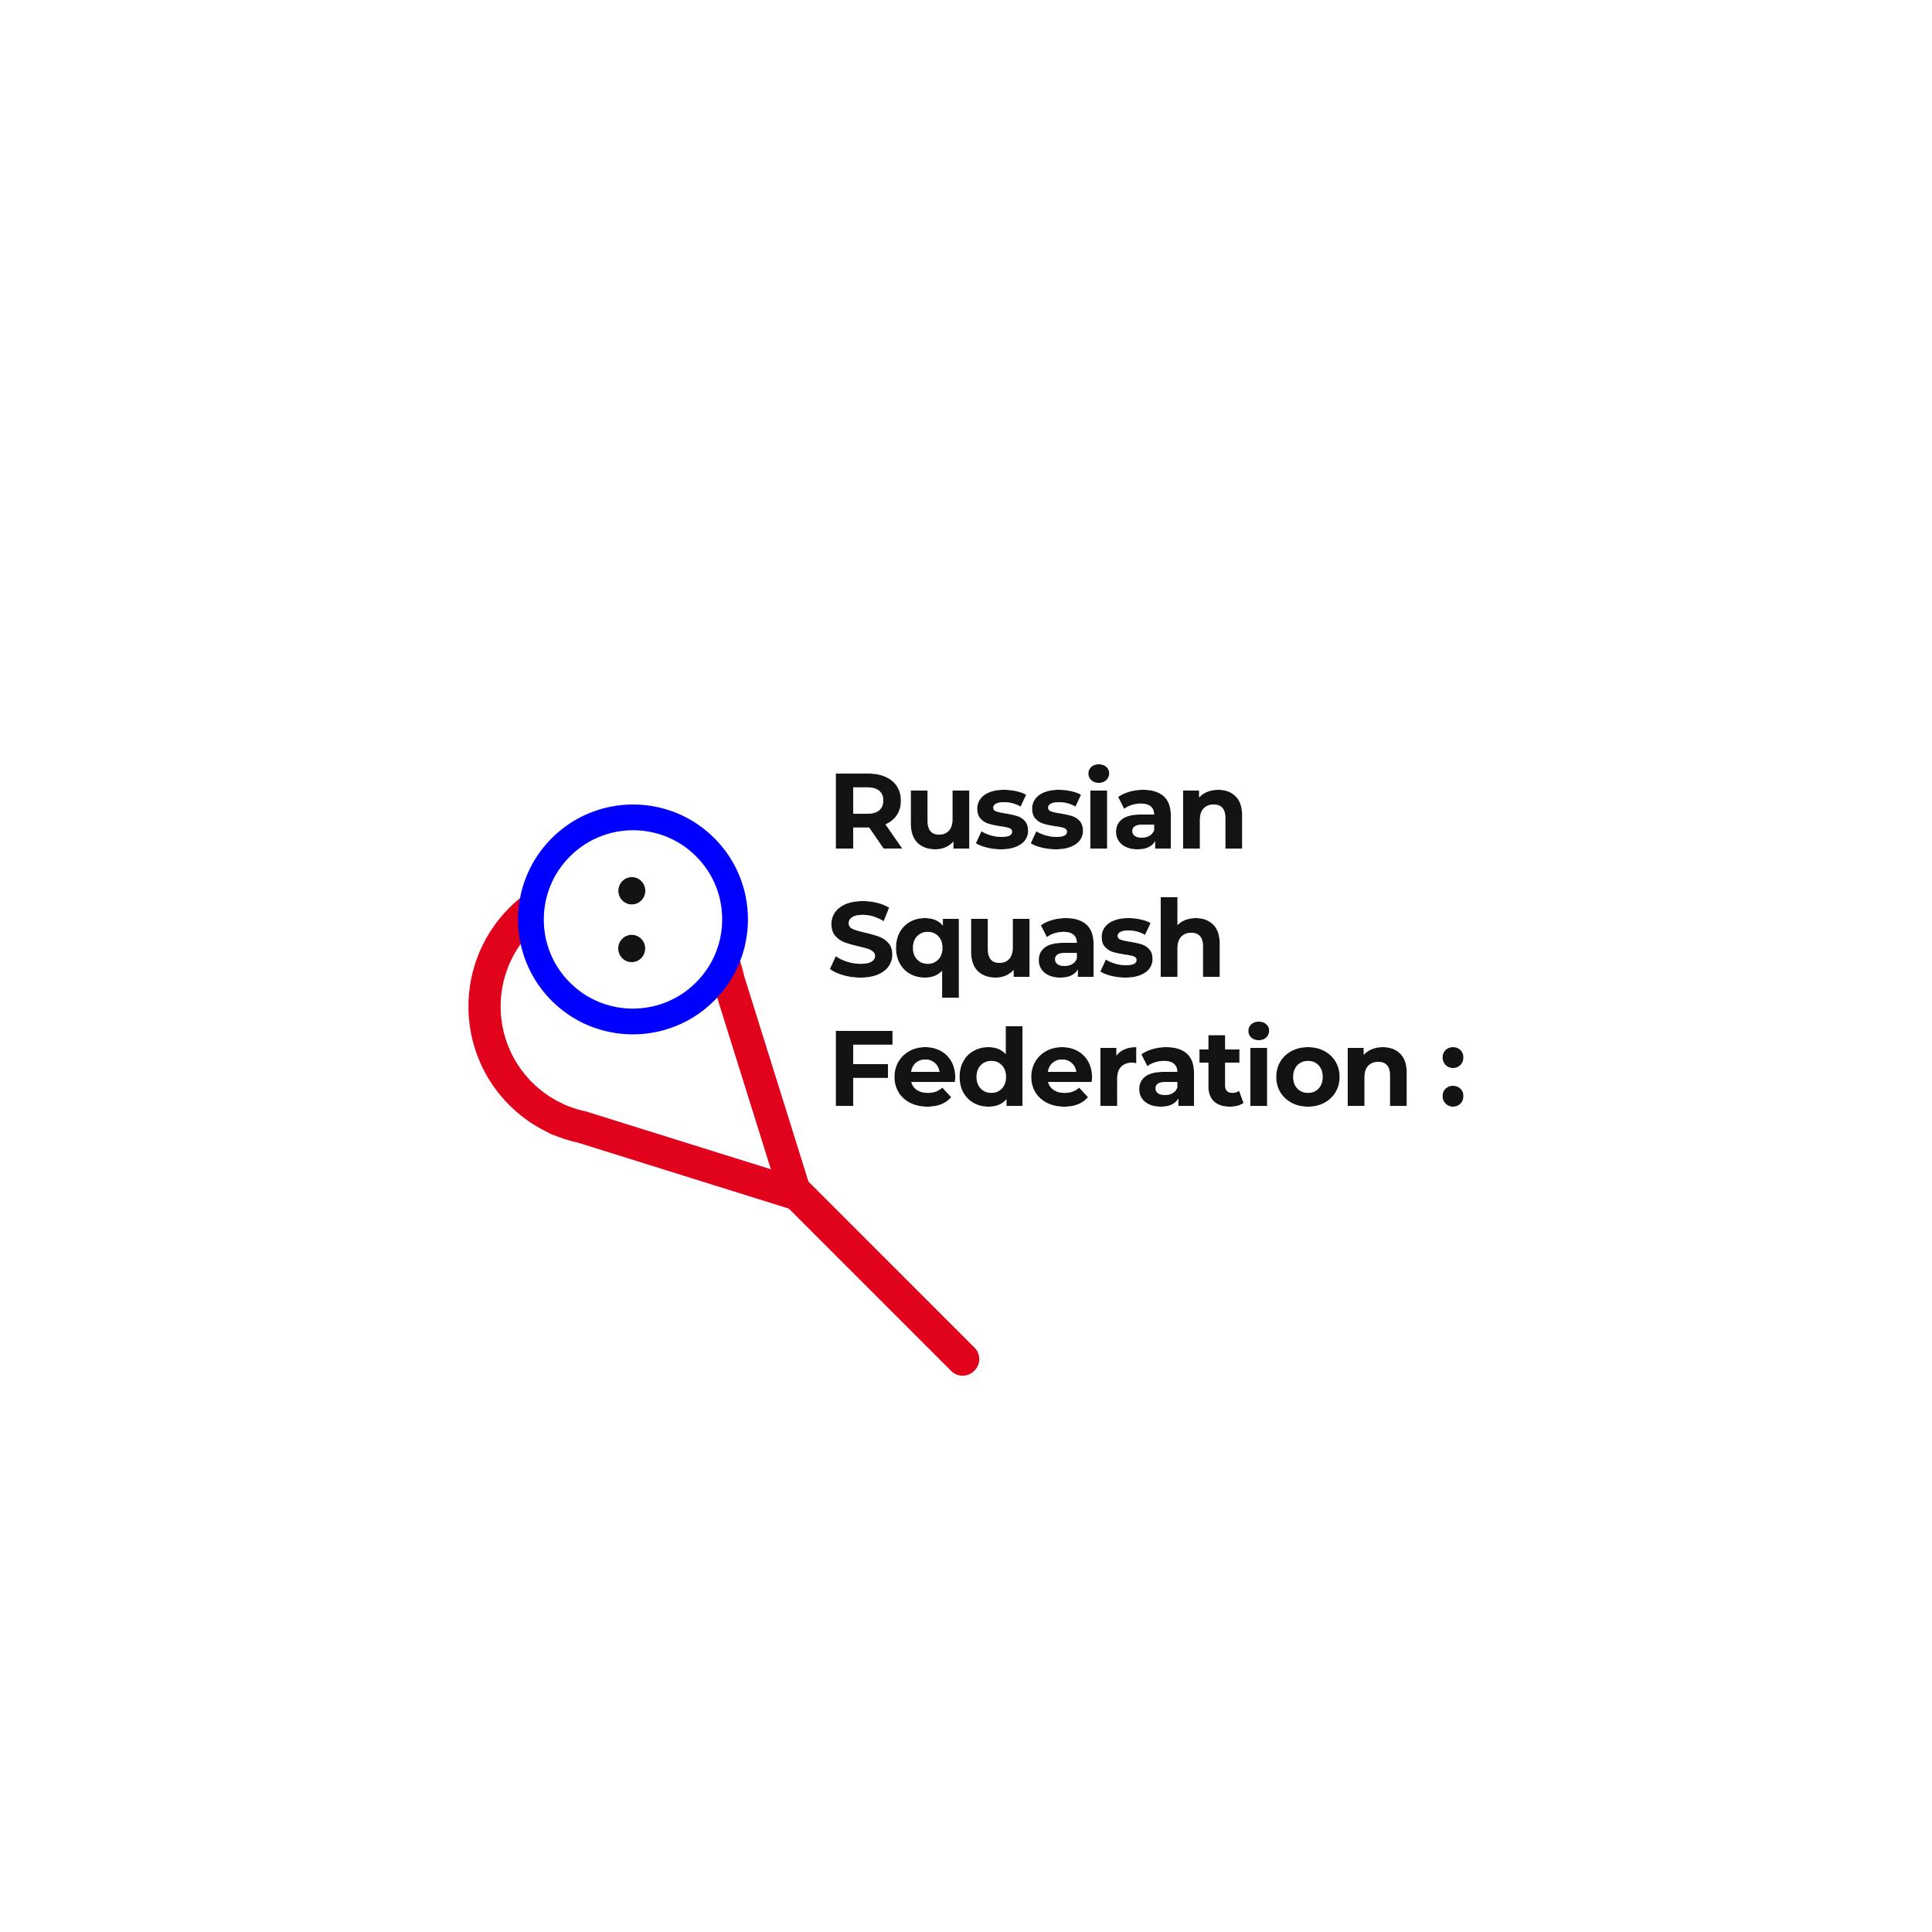 Разработать логотип для Федерации сквоша России фото f_3845f33d4f0e5b0c.jpg